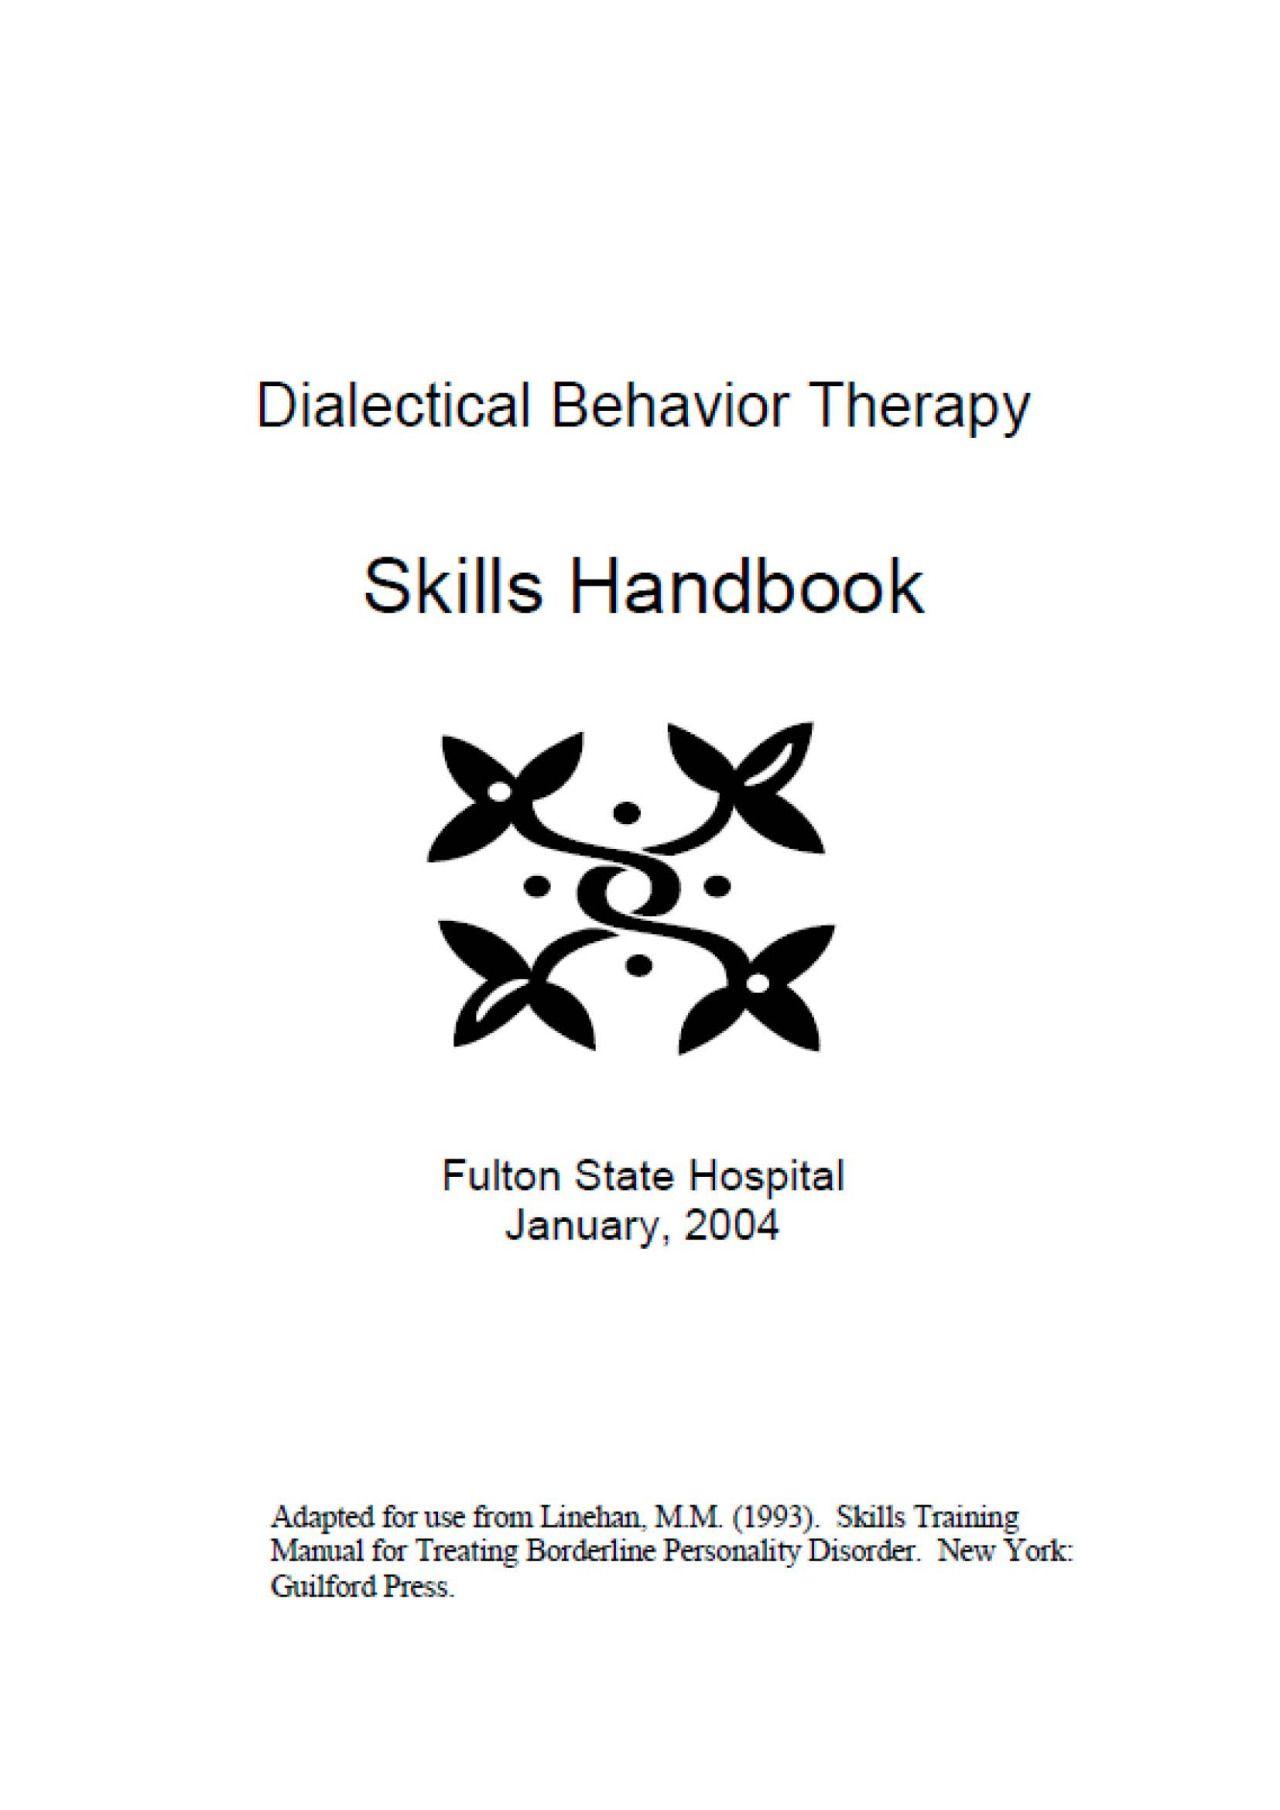 Healingschemas The Dbt Skills Handbook Is Probably The Best Dbt Skills Resource Available